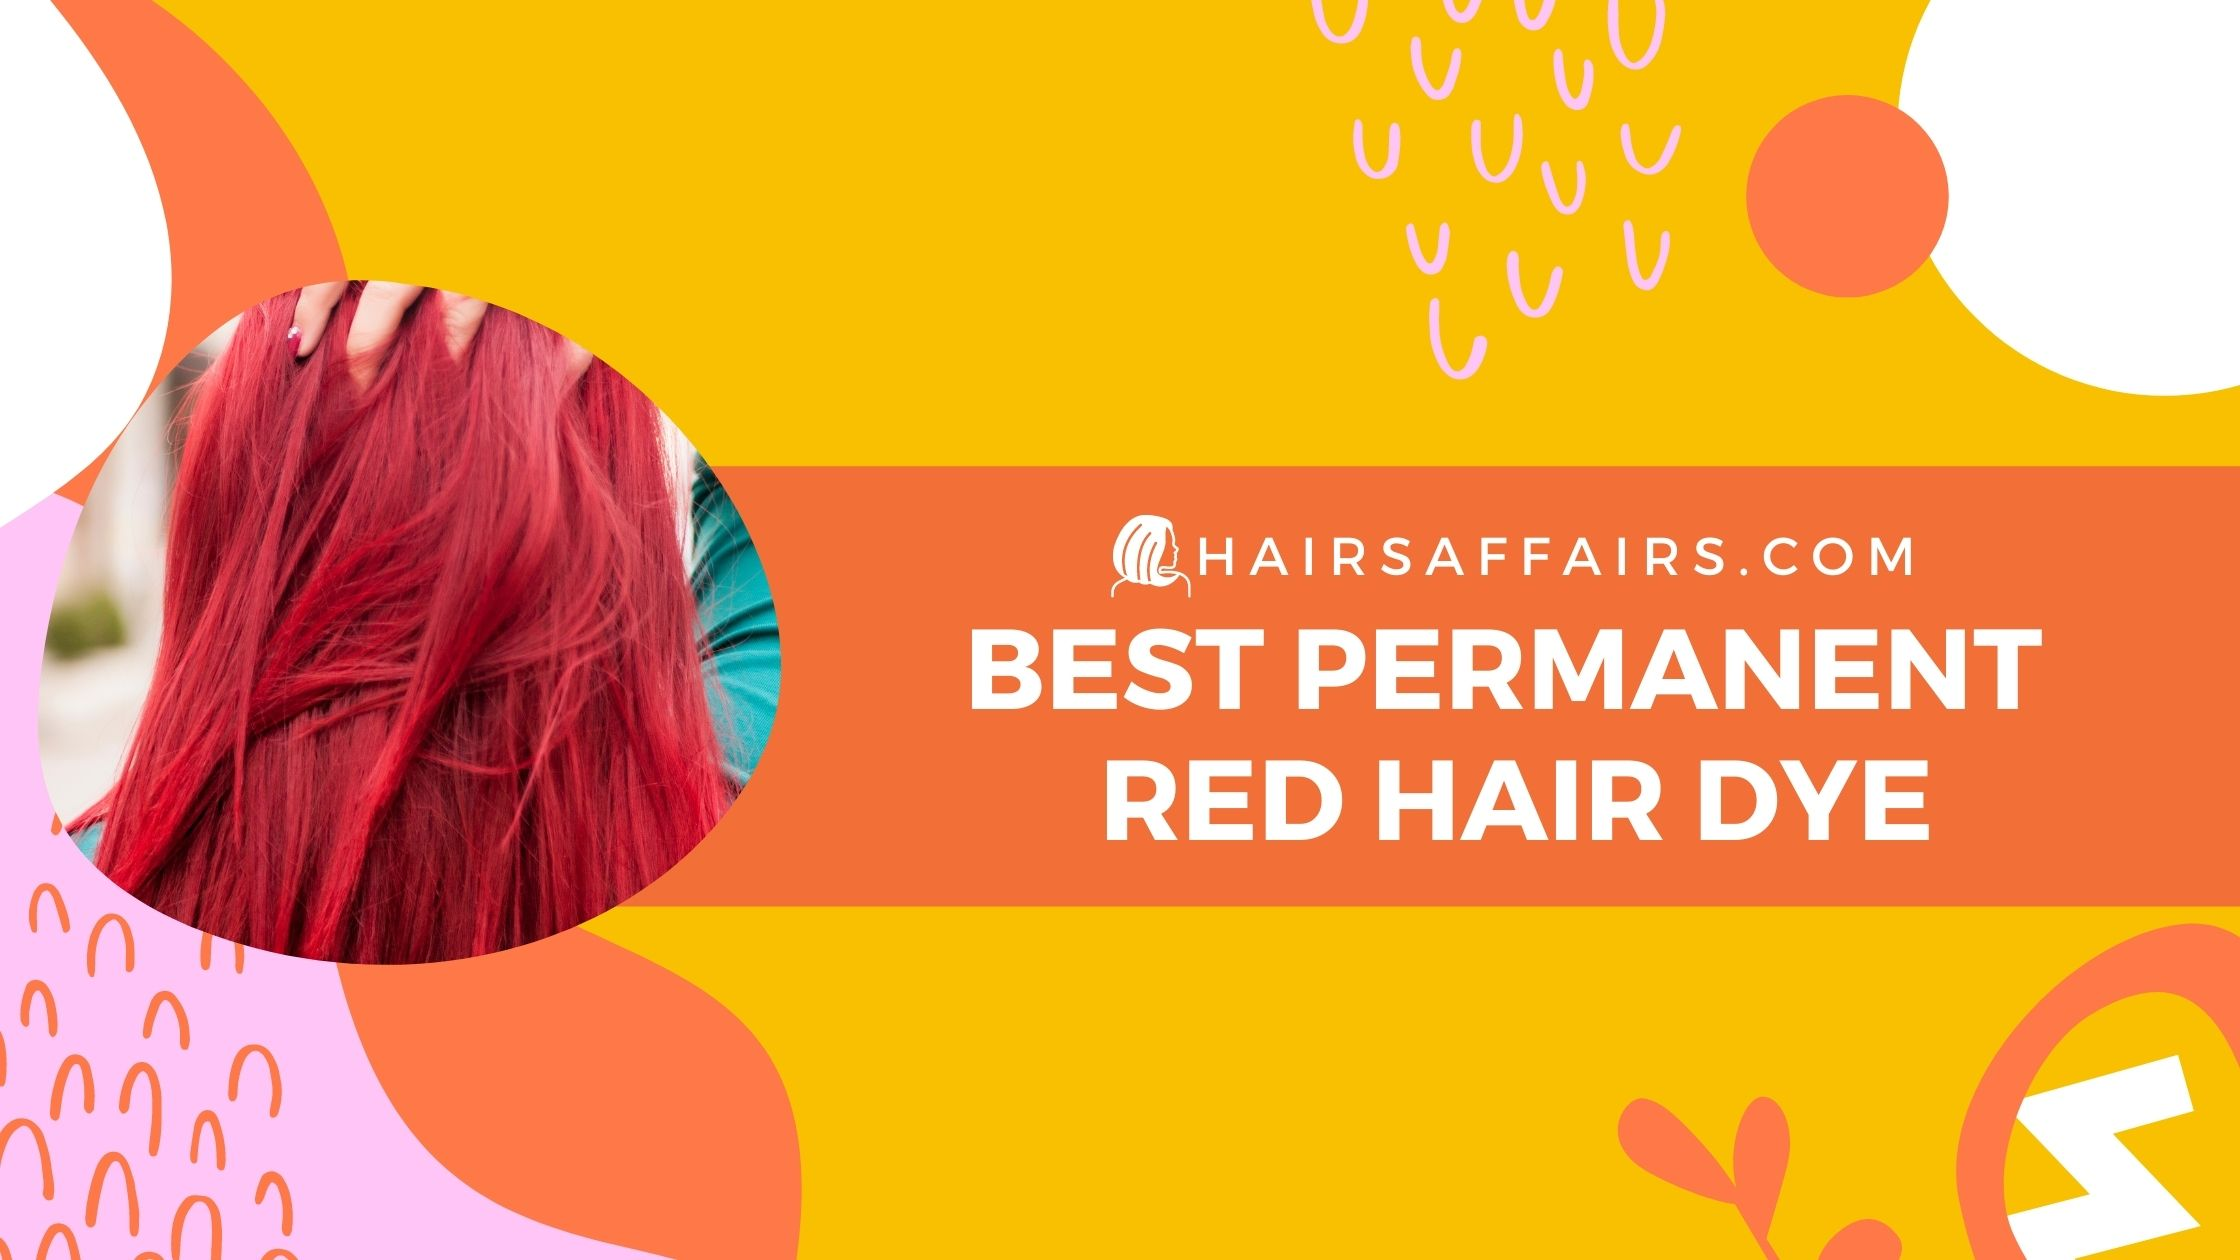 HA-Best-permanent-red-hair-dye